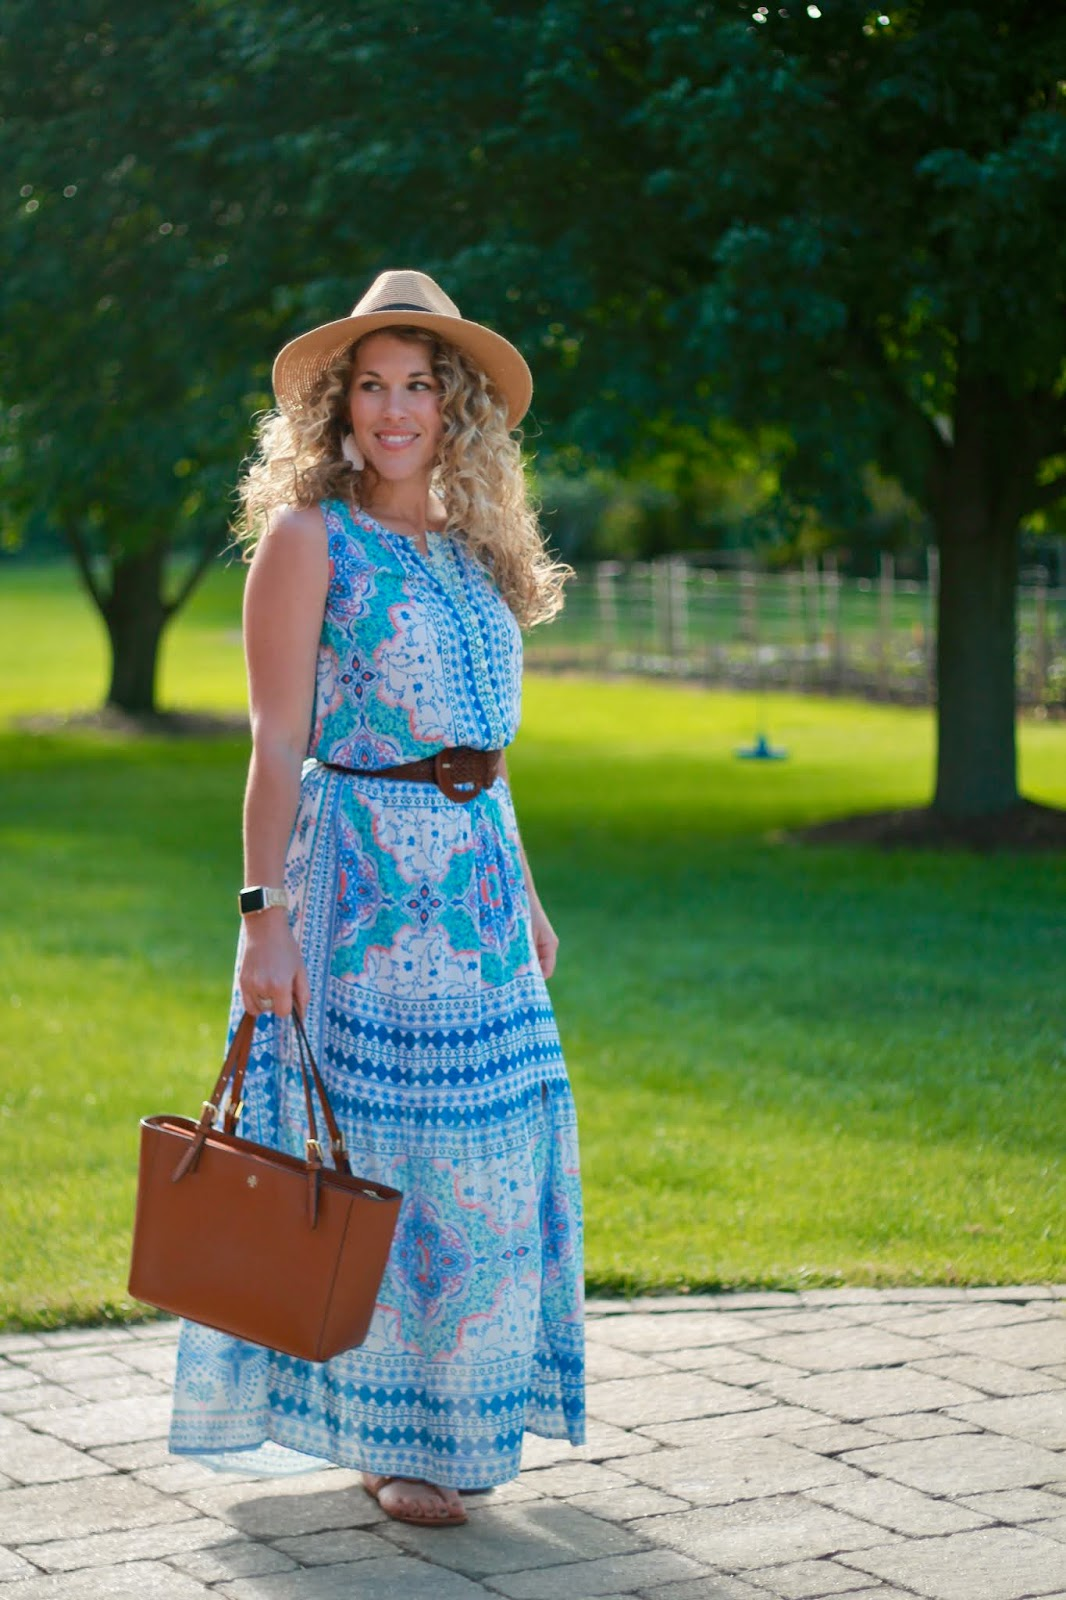 kyla seo avery dress, blue floral maxi dress, caite & kyla review, summer maxi dress, woven belt, tory burch millers, straw fedora, tory burch tote